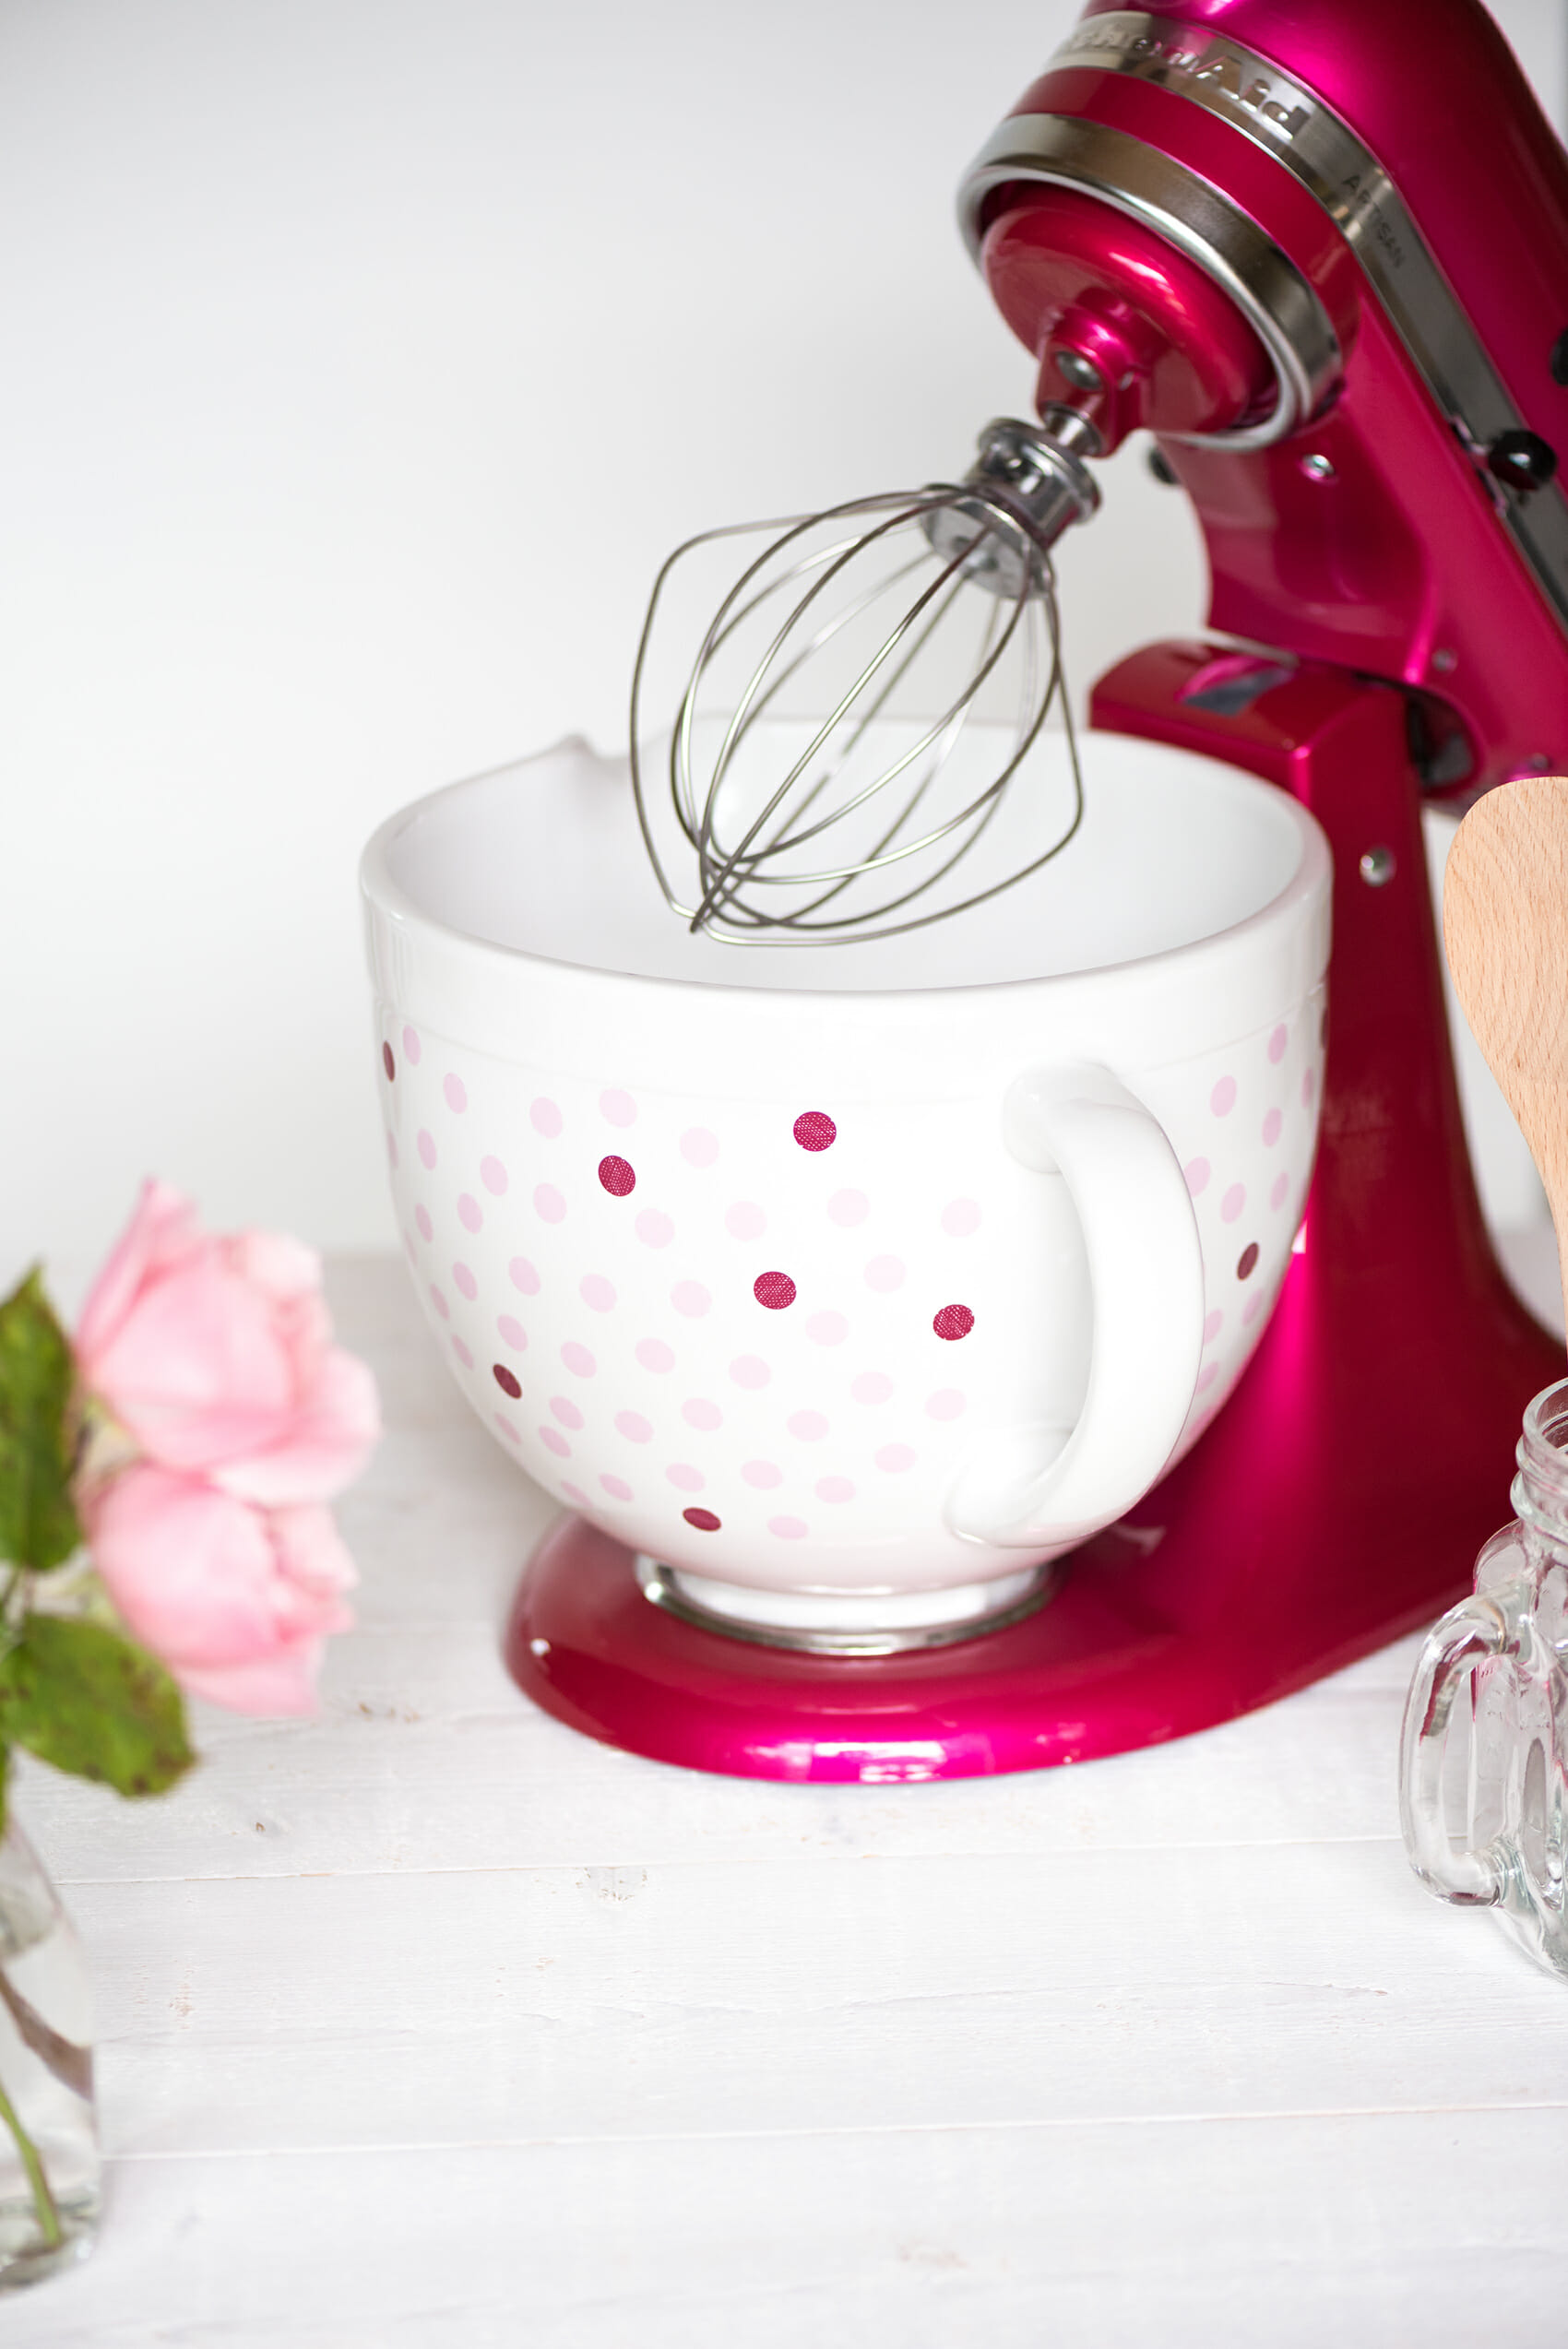 Octobre Rose Kitchenaid Lilie Bakery